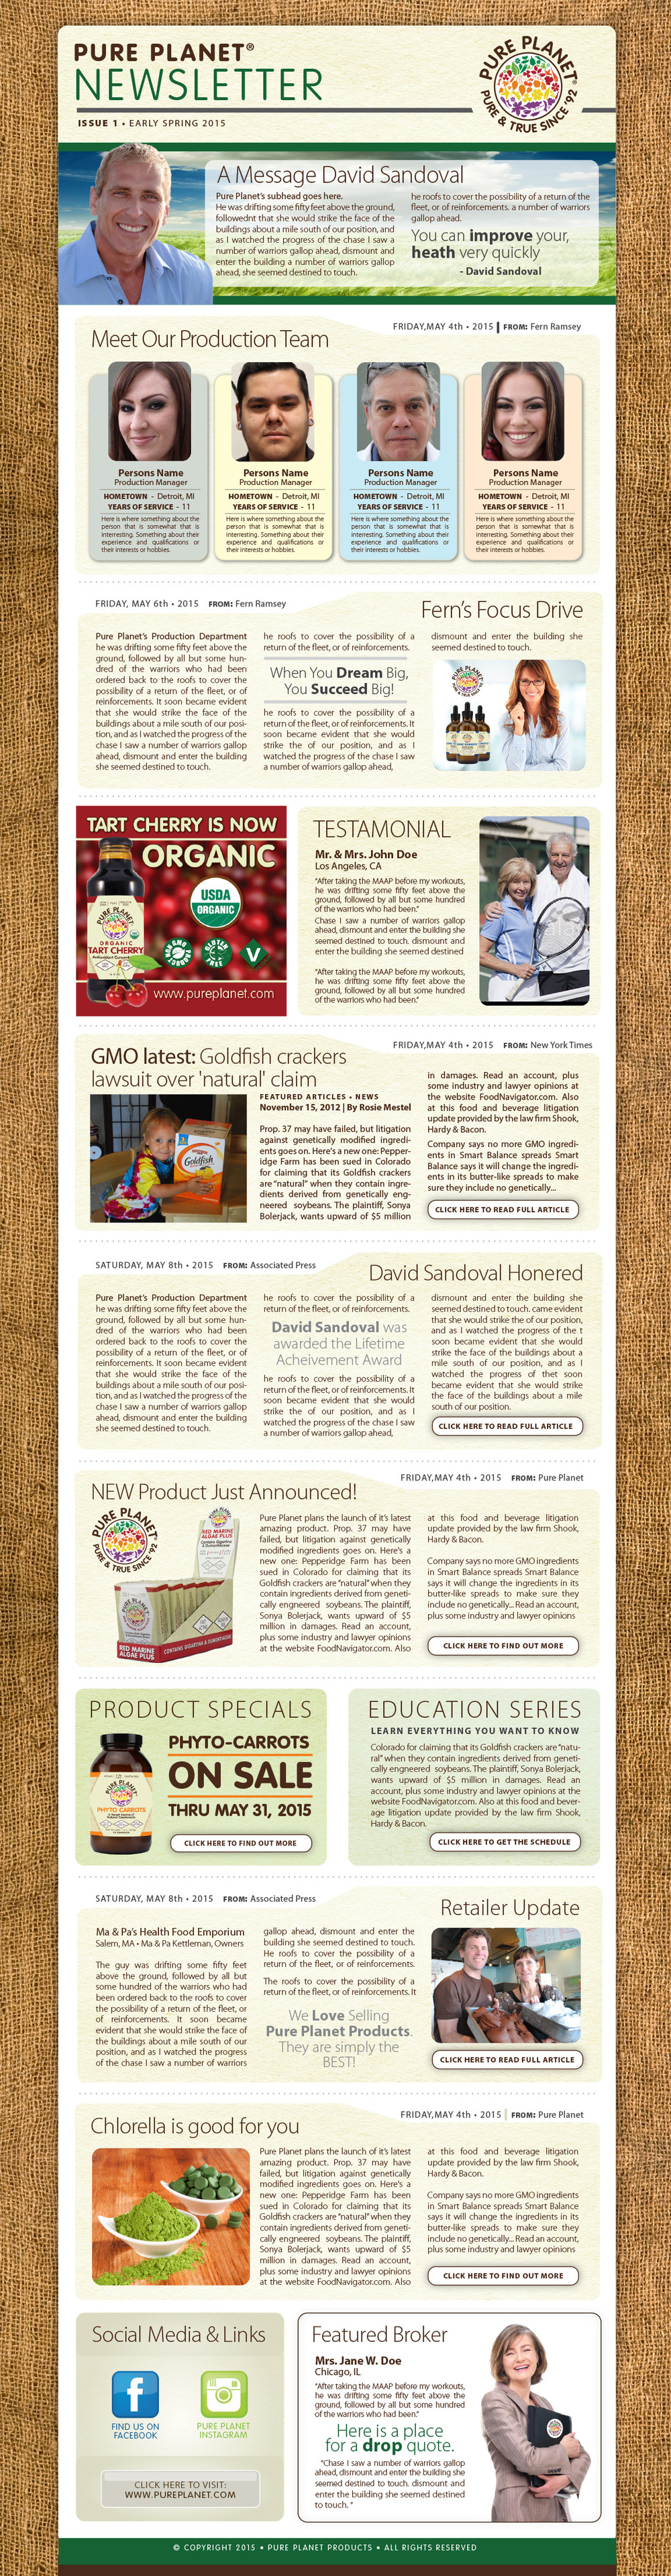 Pure Planet Newletter Design_1.jpg